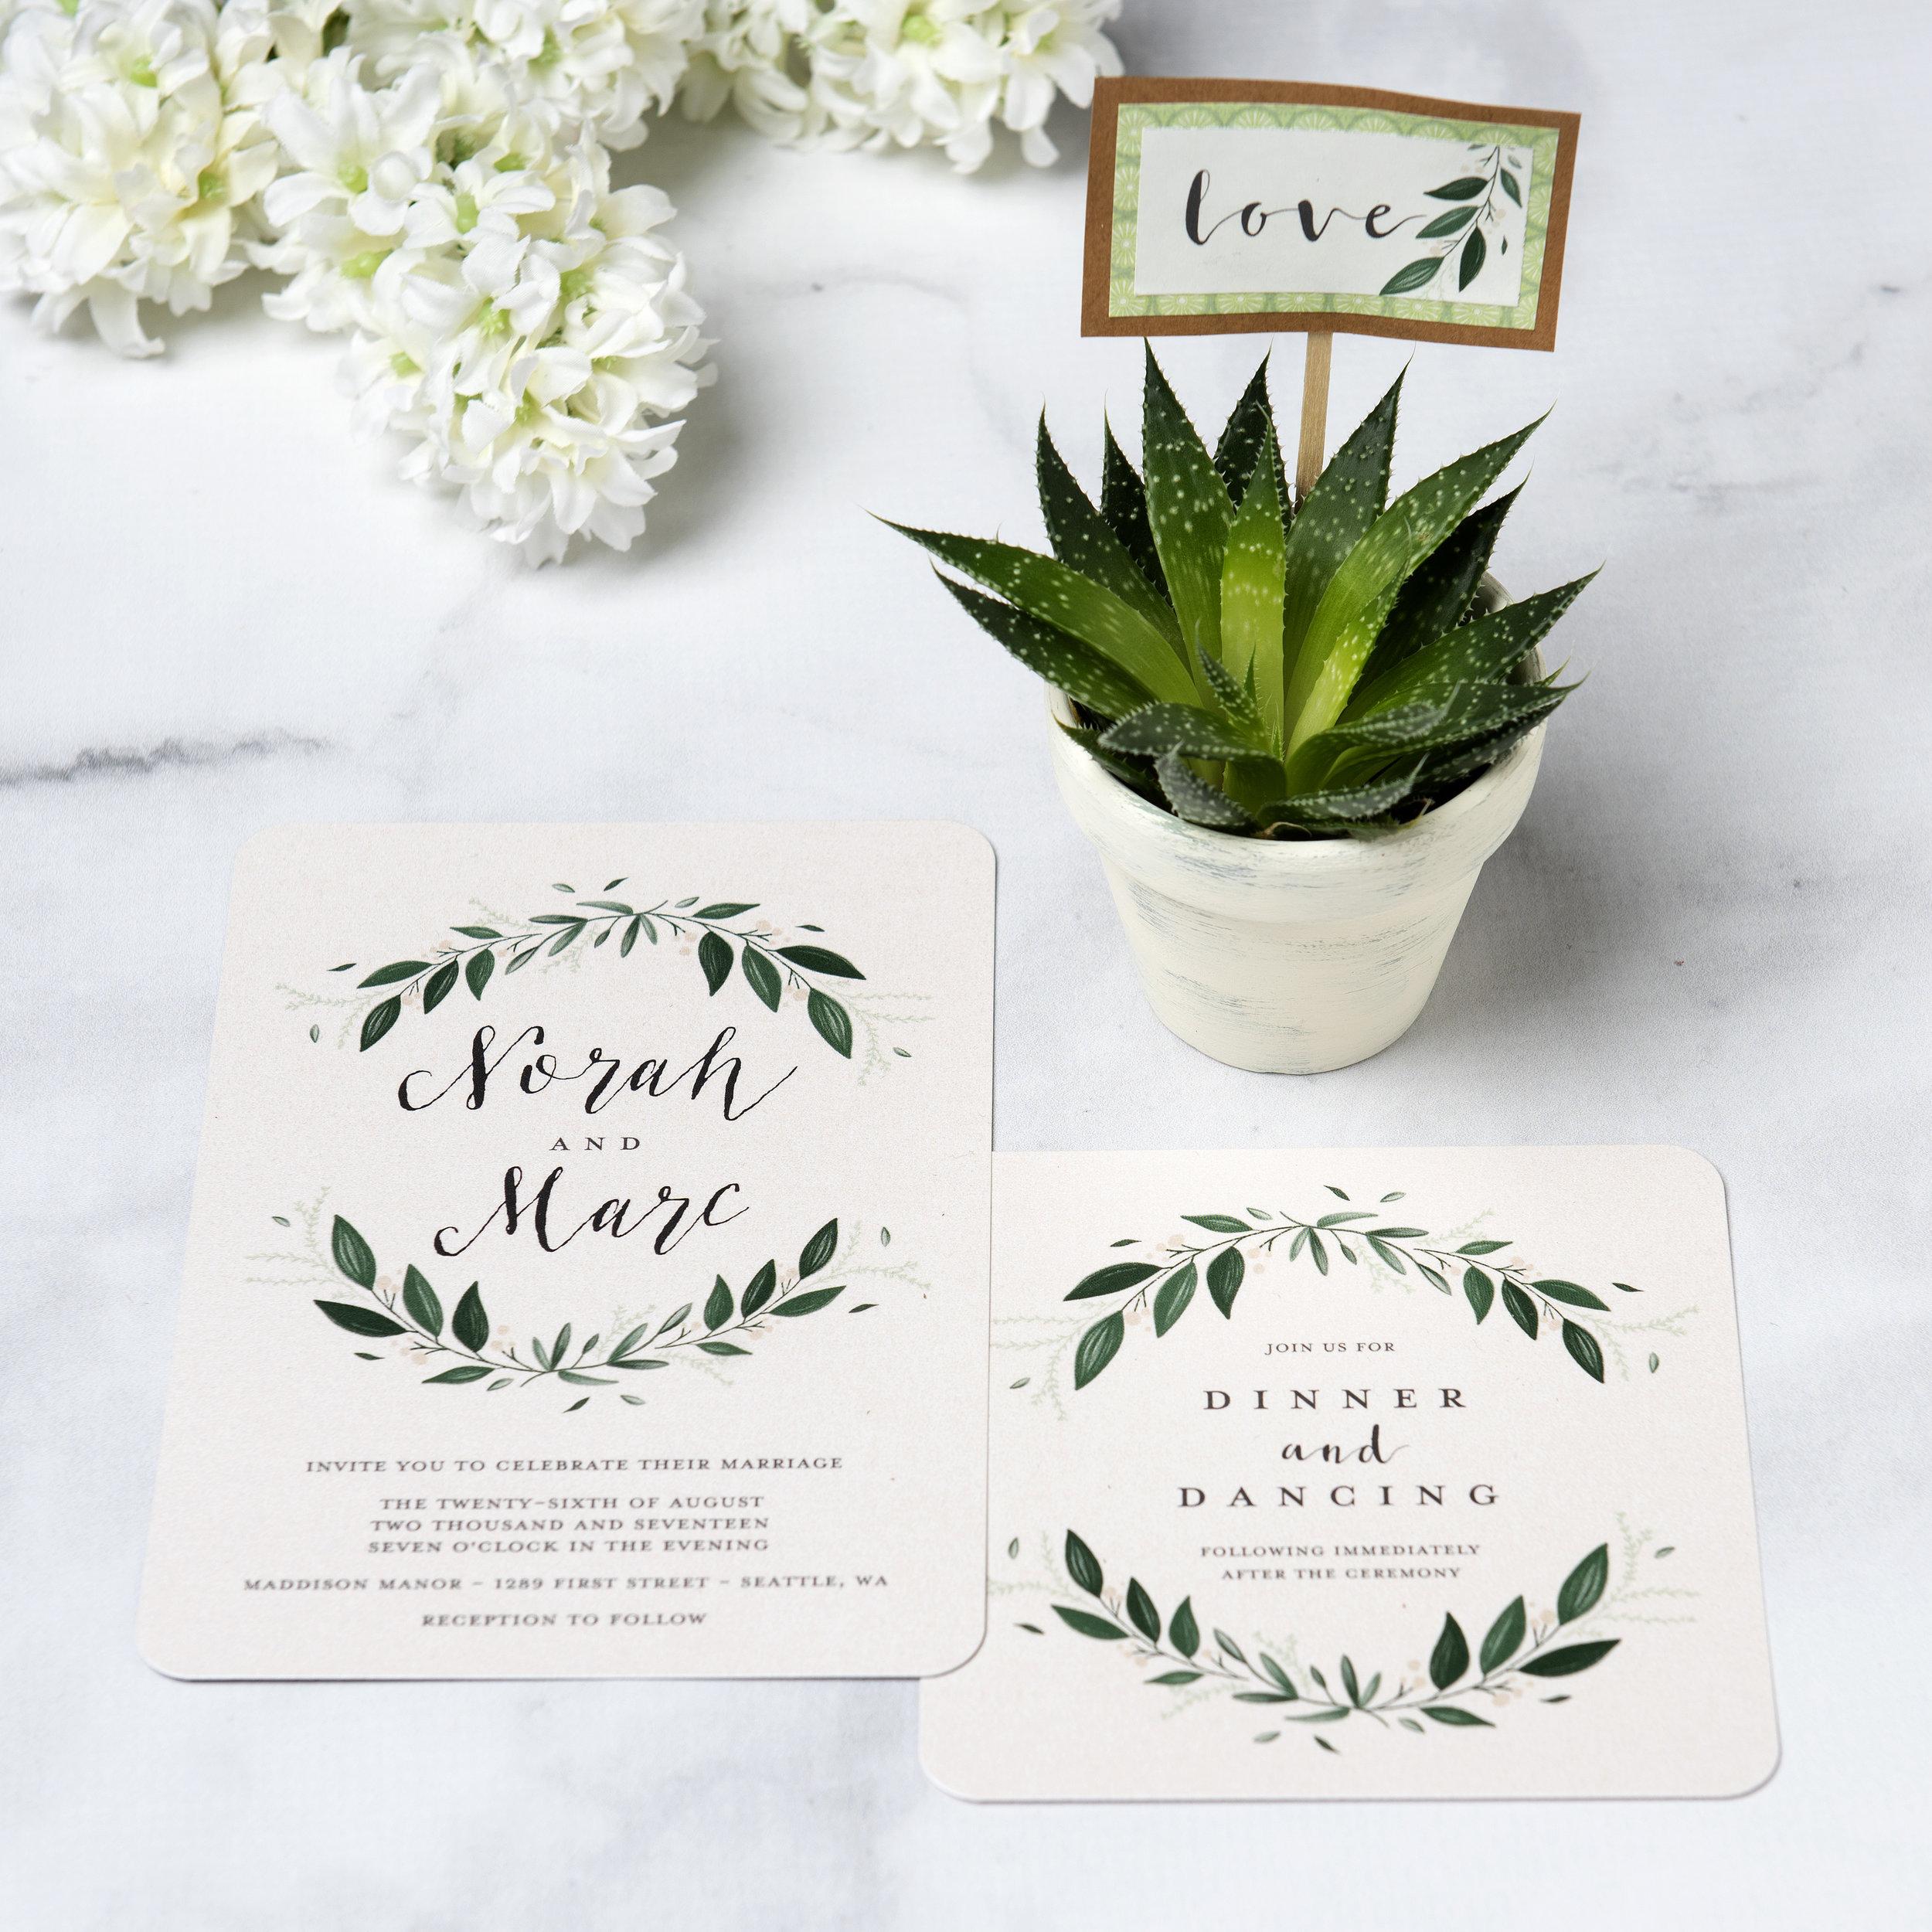 mixbook-marble-wedding-plaid-craft-diy-invitation-2.jpg